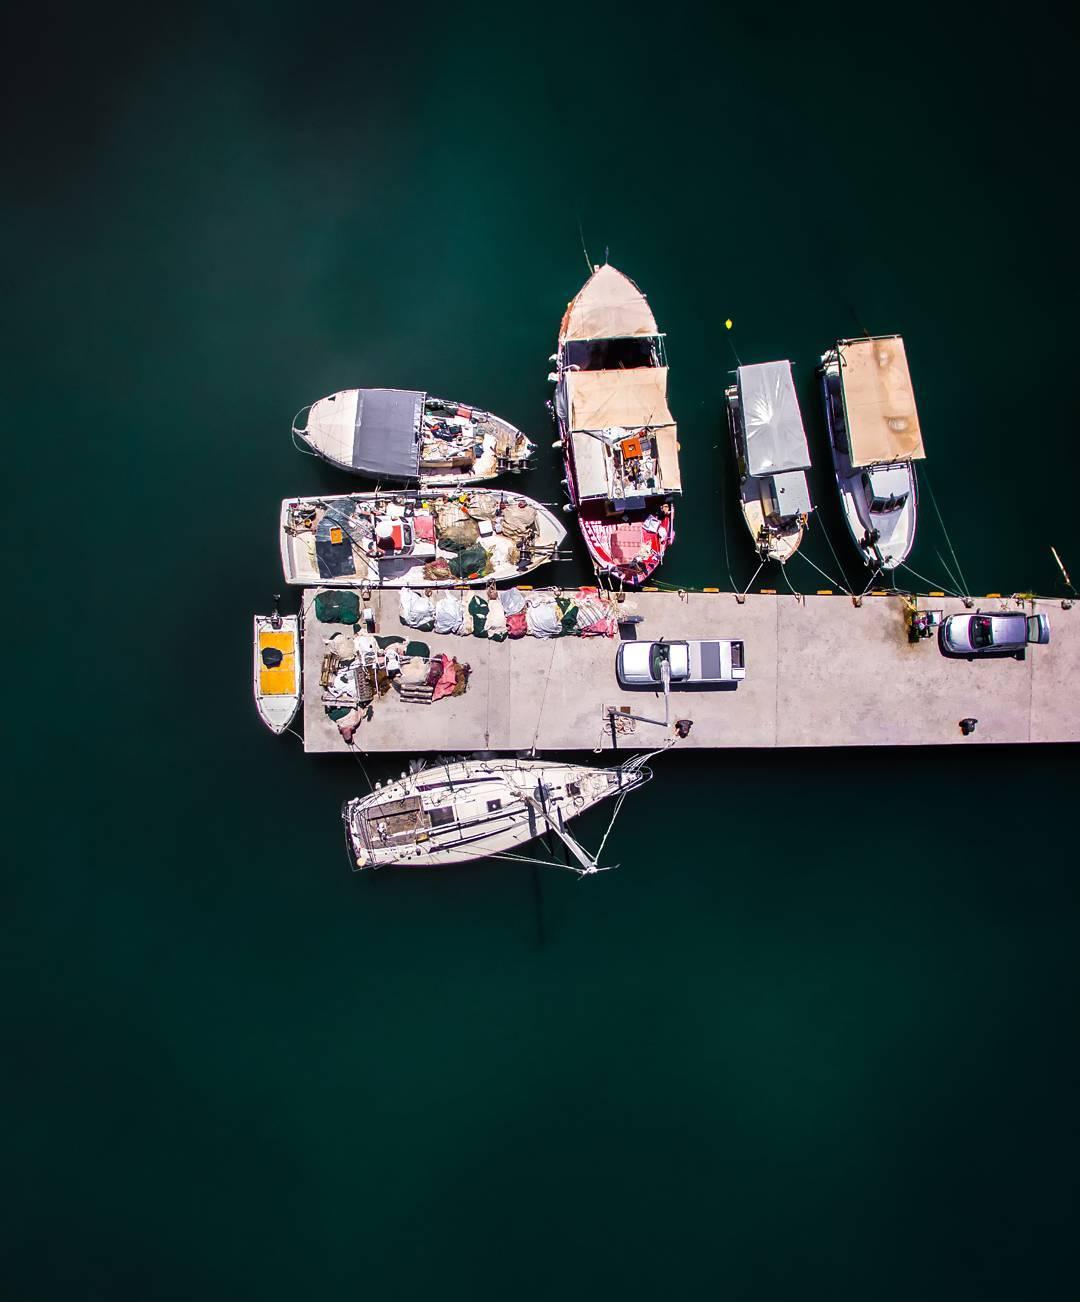 22159262 363637177427154 6169965939430260736 n - Οι εντυπωσιακές φωτογραφίες από την Λάρισα και τα παράλια της από «ψηλά»